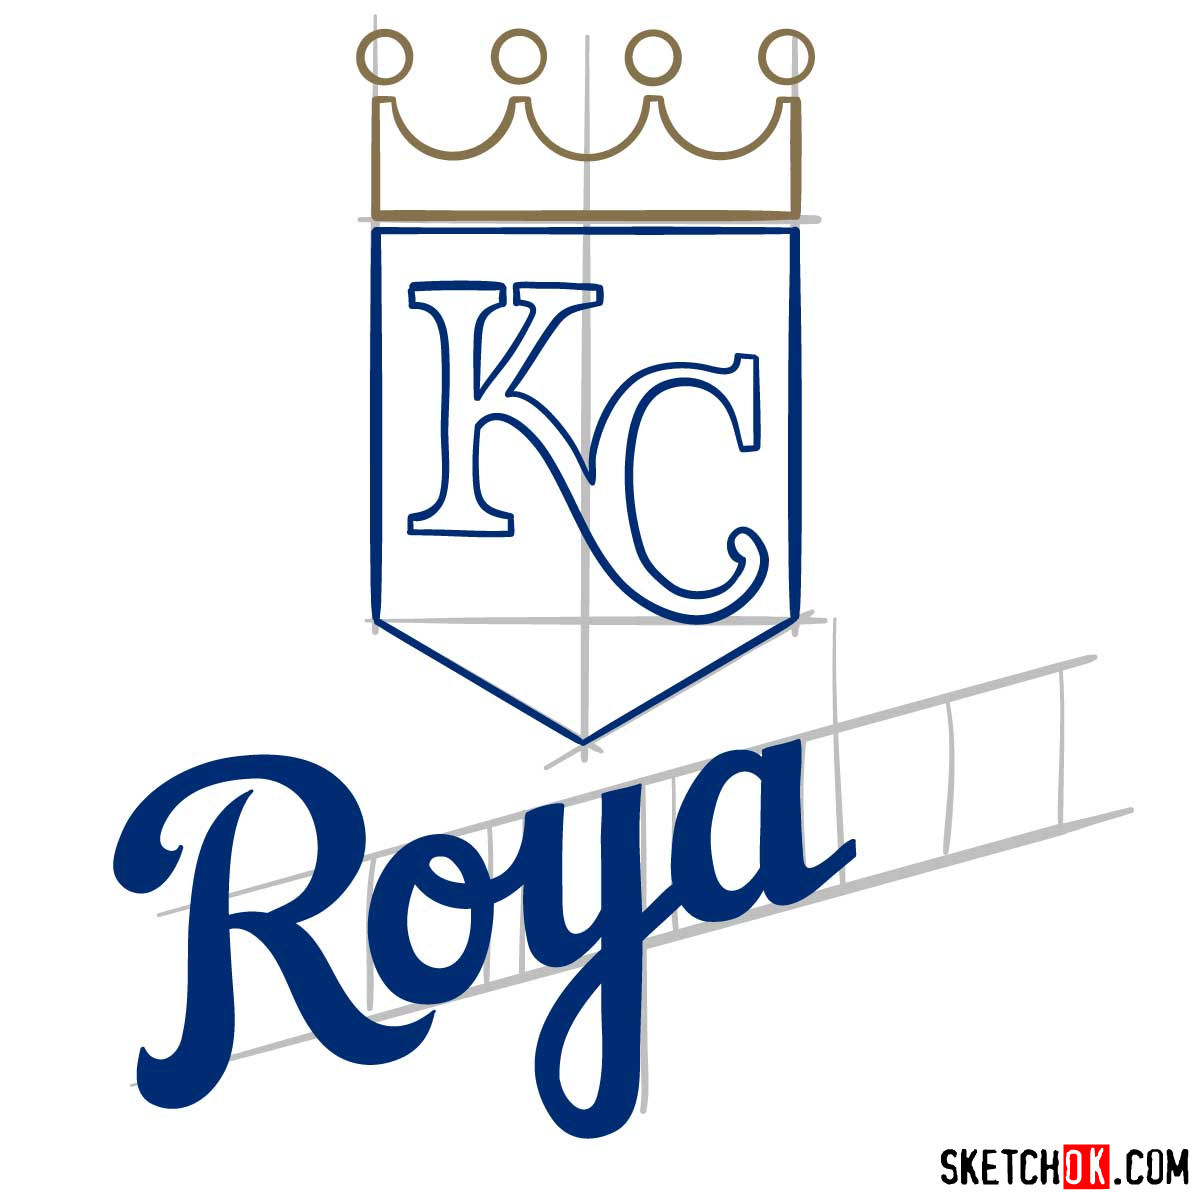 How to draw Kansas City Royals logo | MLB logos - step 07